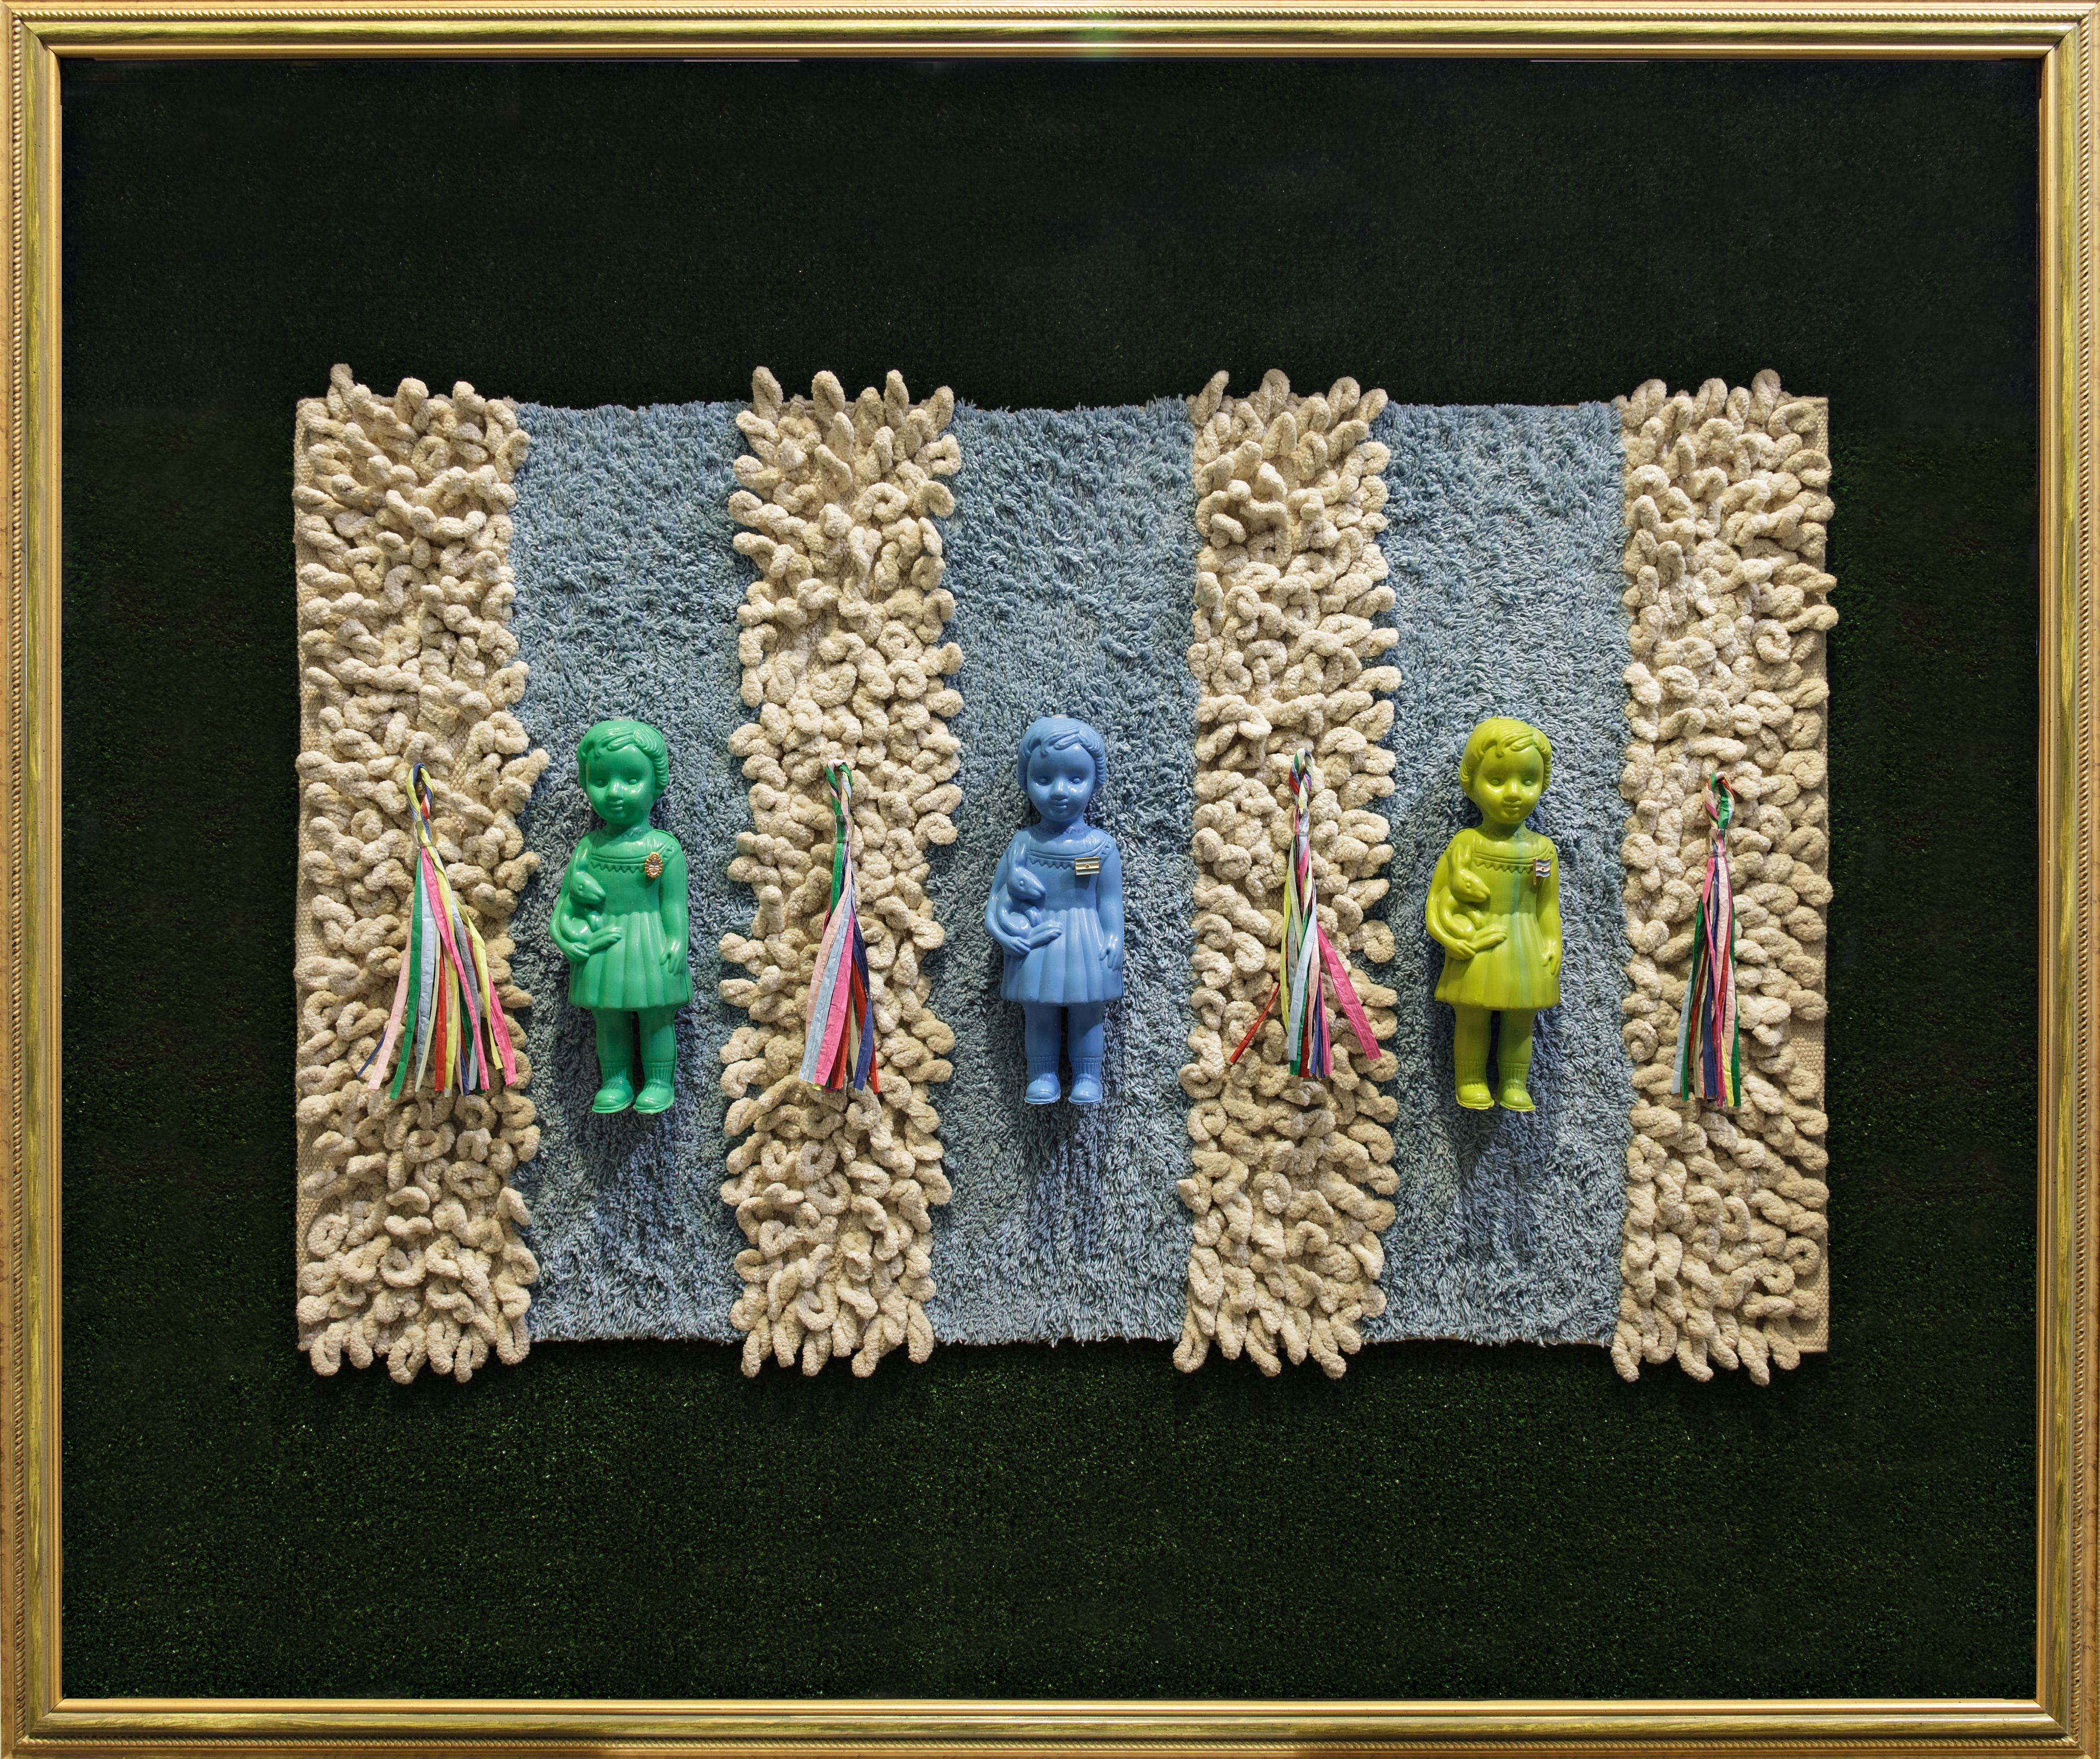 La Niña Argentina, serie, objetos ensamblados; 102 cm x 122 cm x 12 cm, 2017